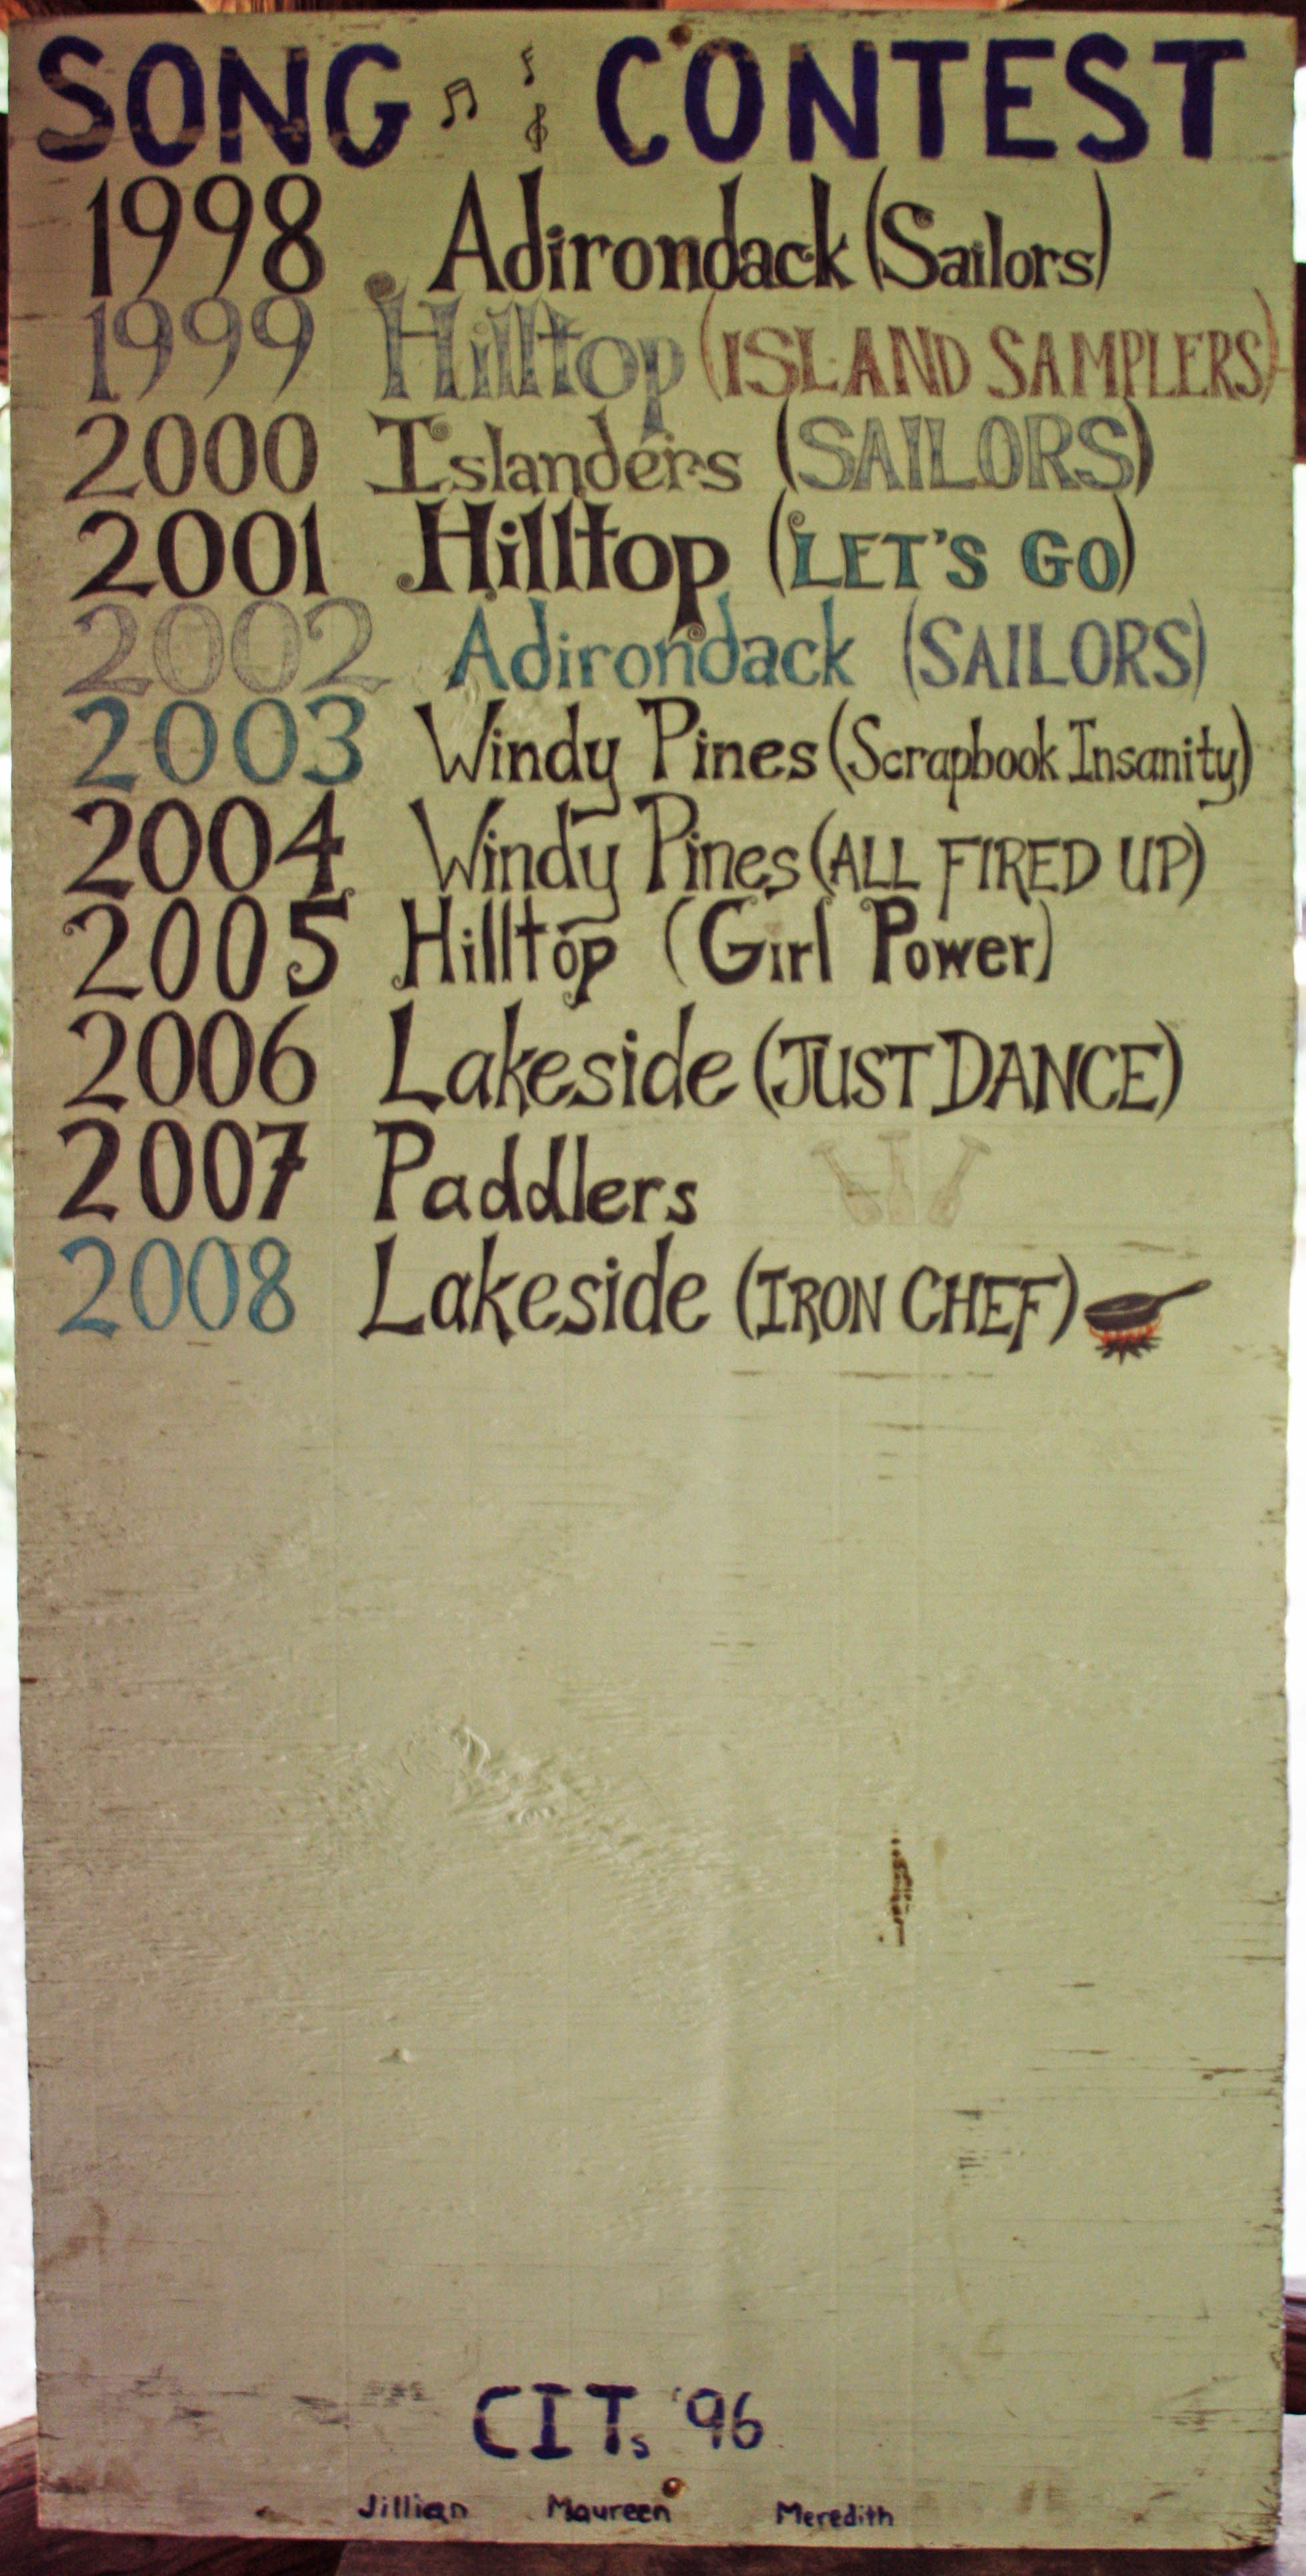 song-contest-winners-1998-2008_29469049187_o.jpg